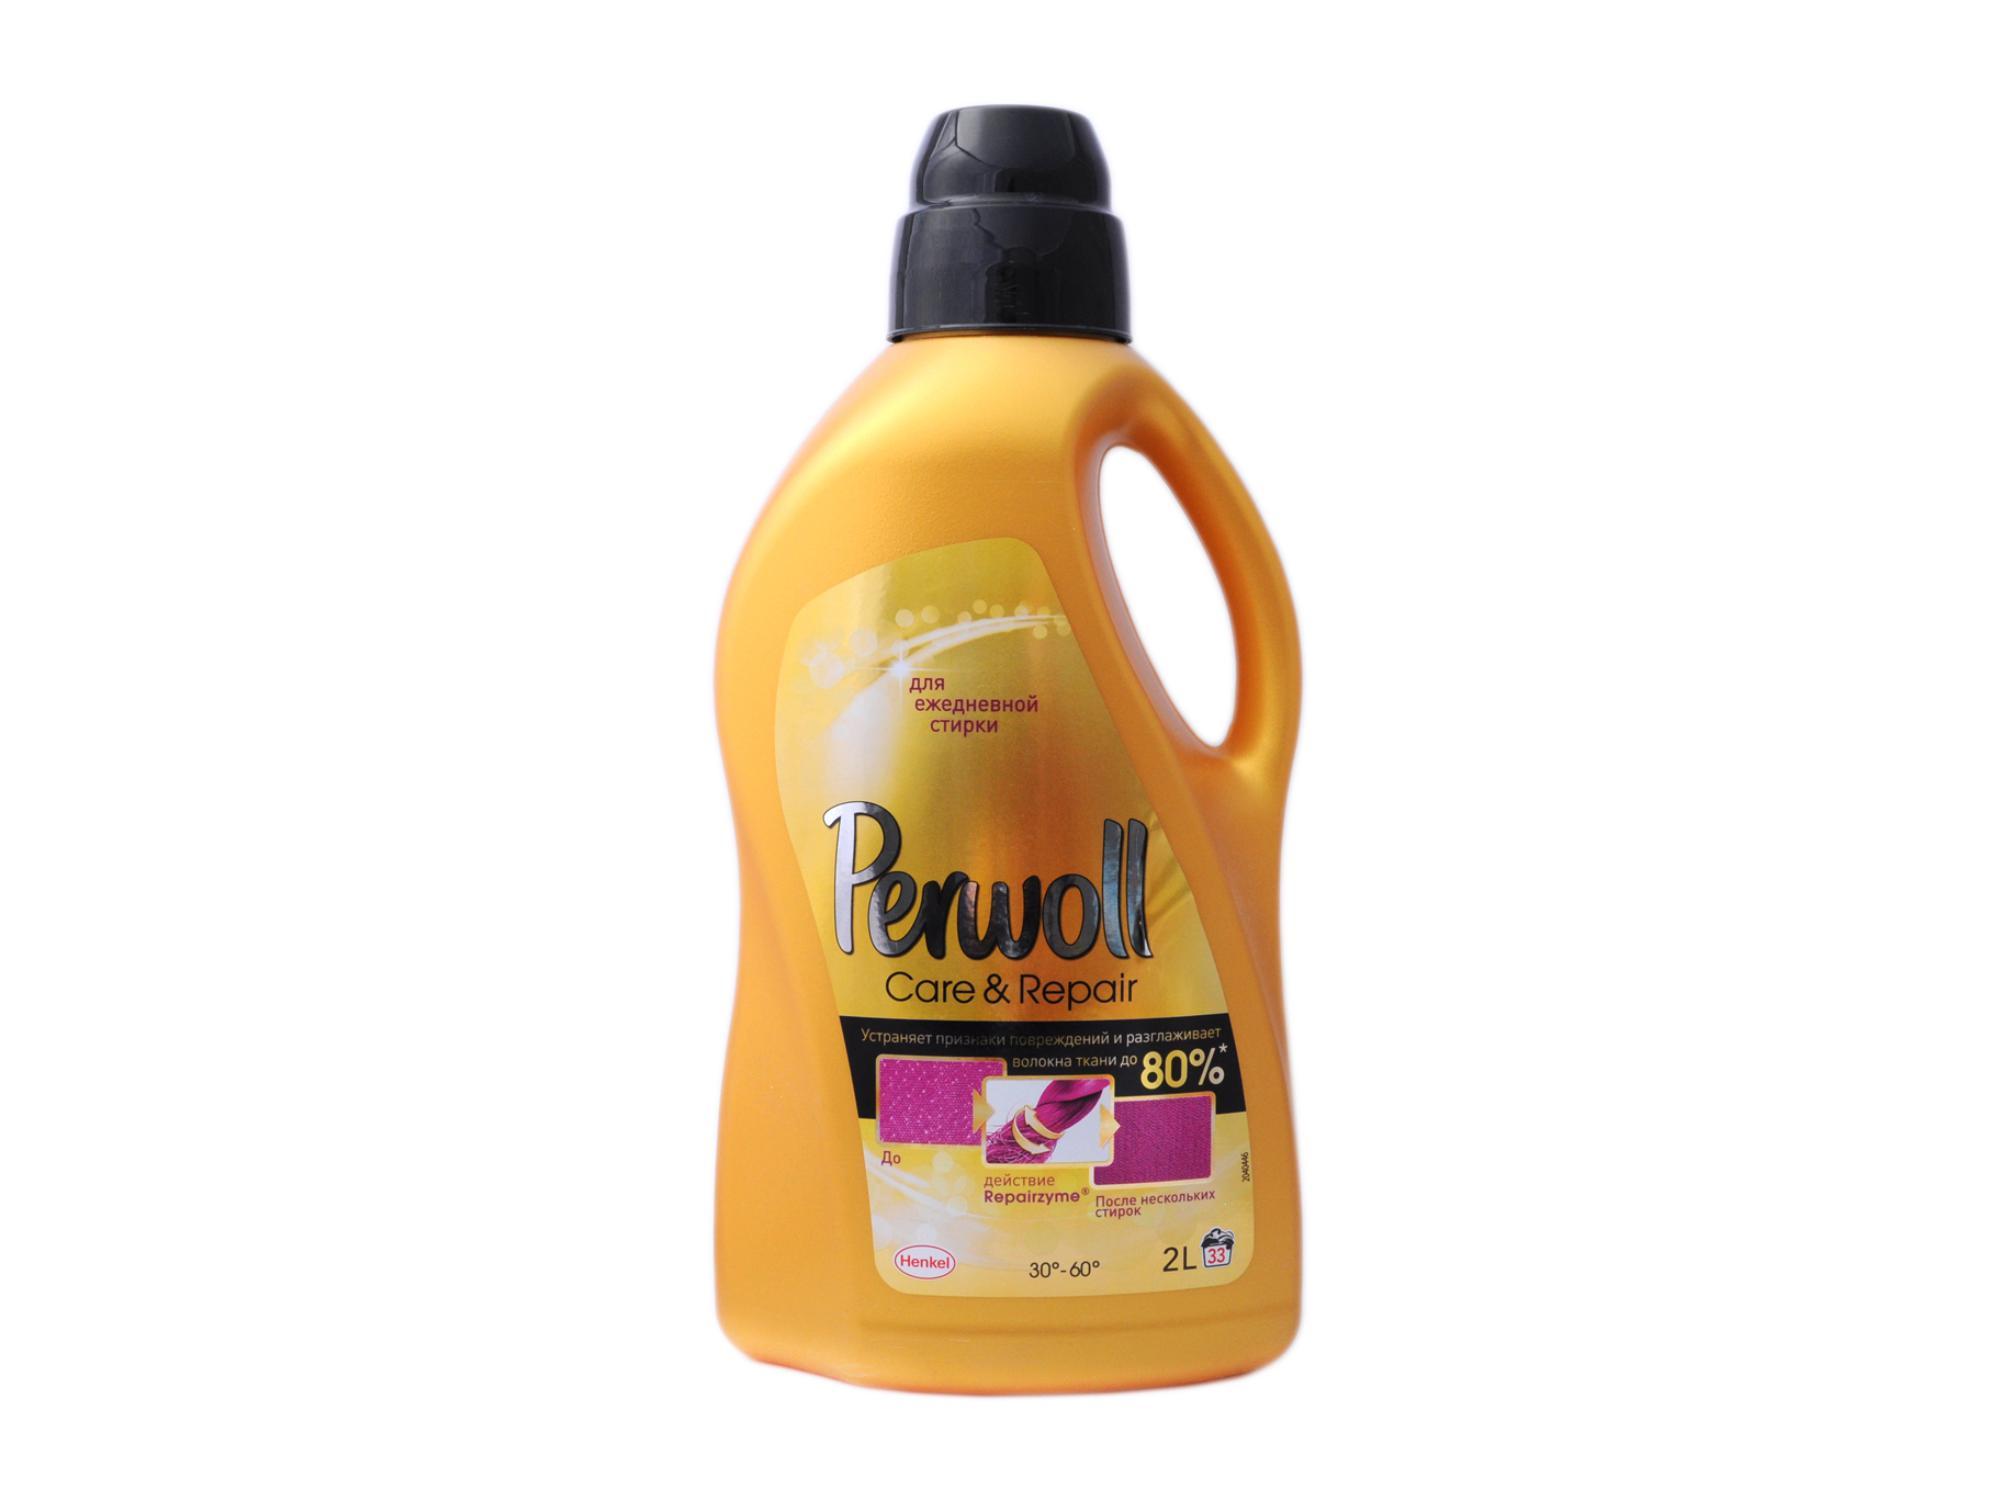 լվացքի փոշի եվ գել PERWOOL GEL CARE&REPAIR 2L(410204) 2463636